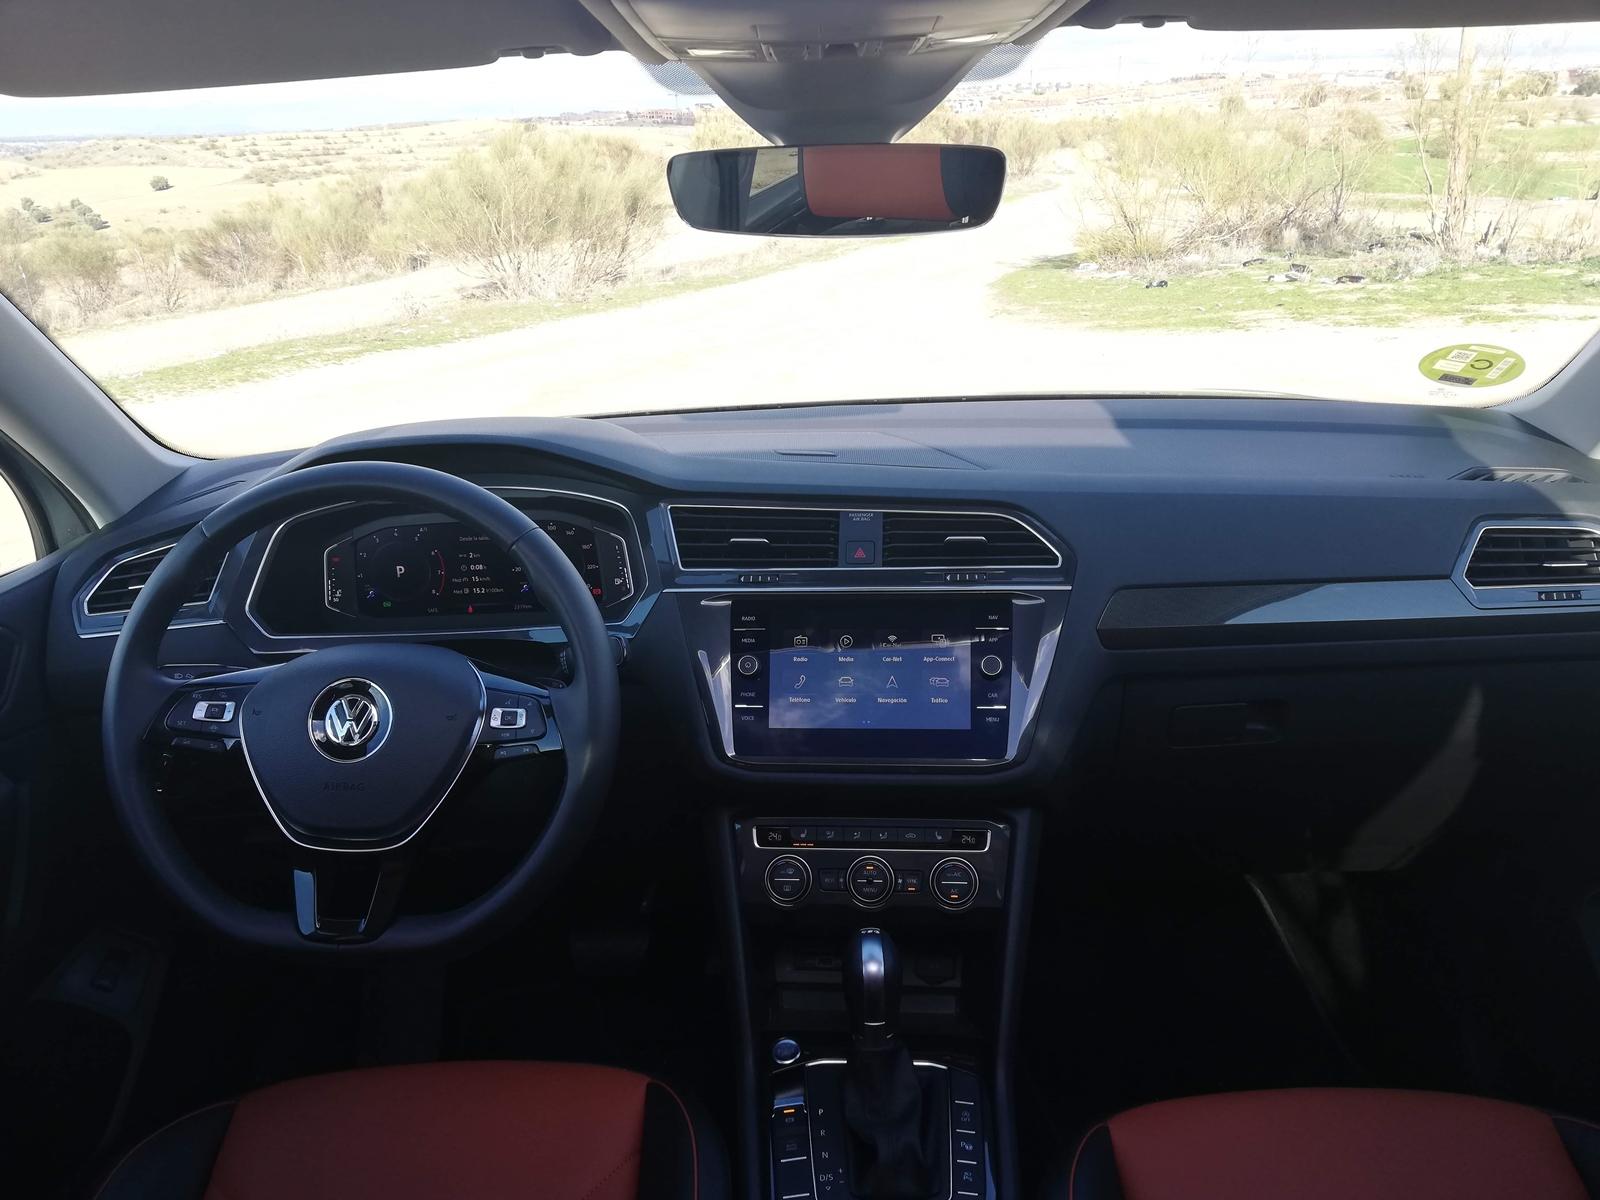 Prueba Volkswagen Tiguan Allspace (23) Copia